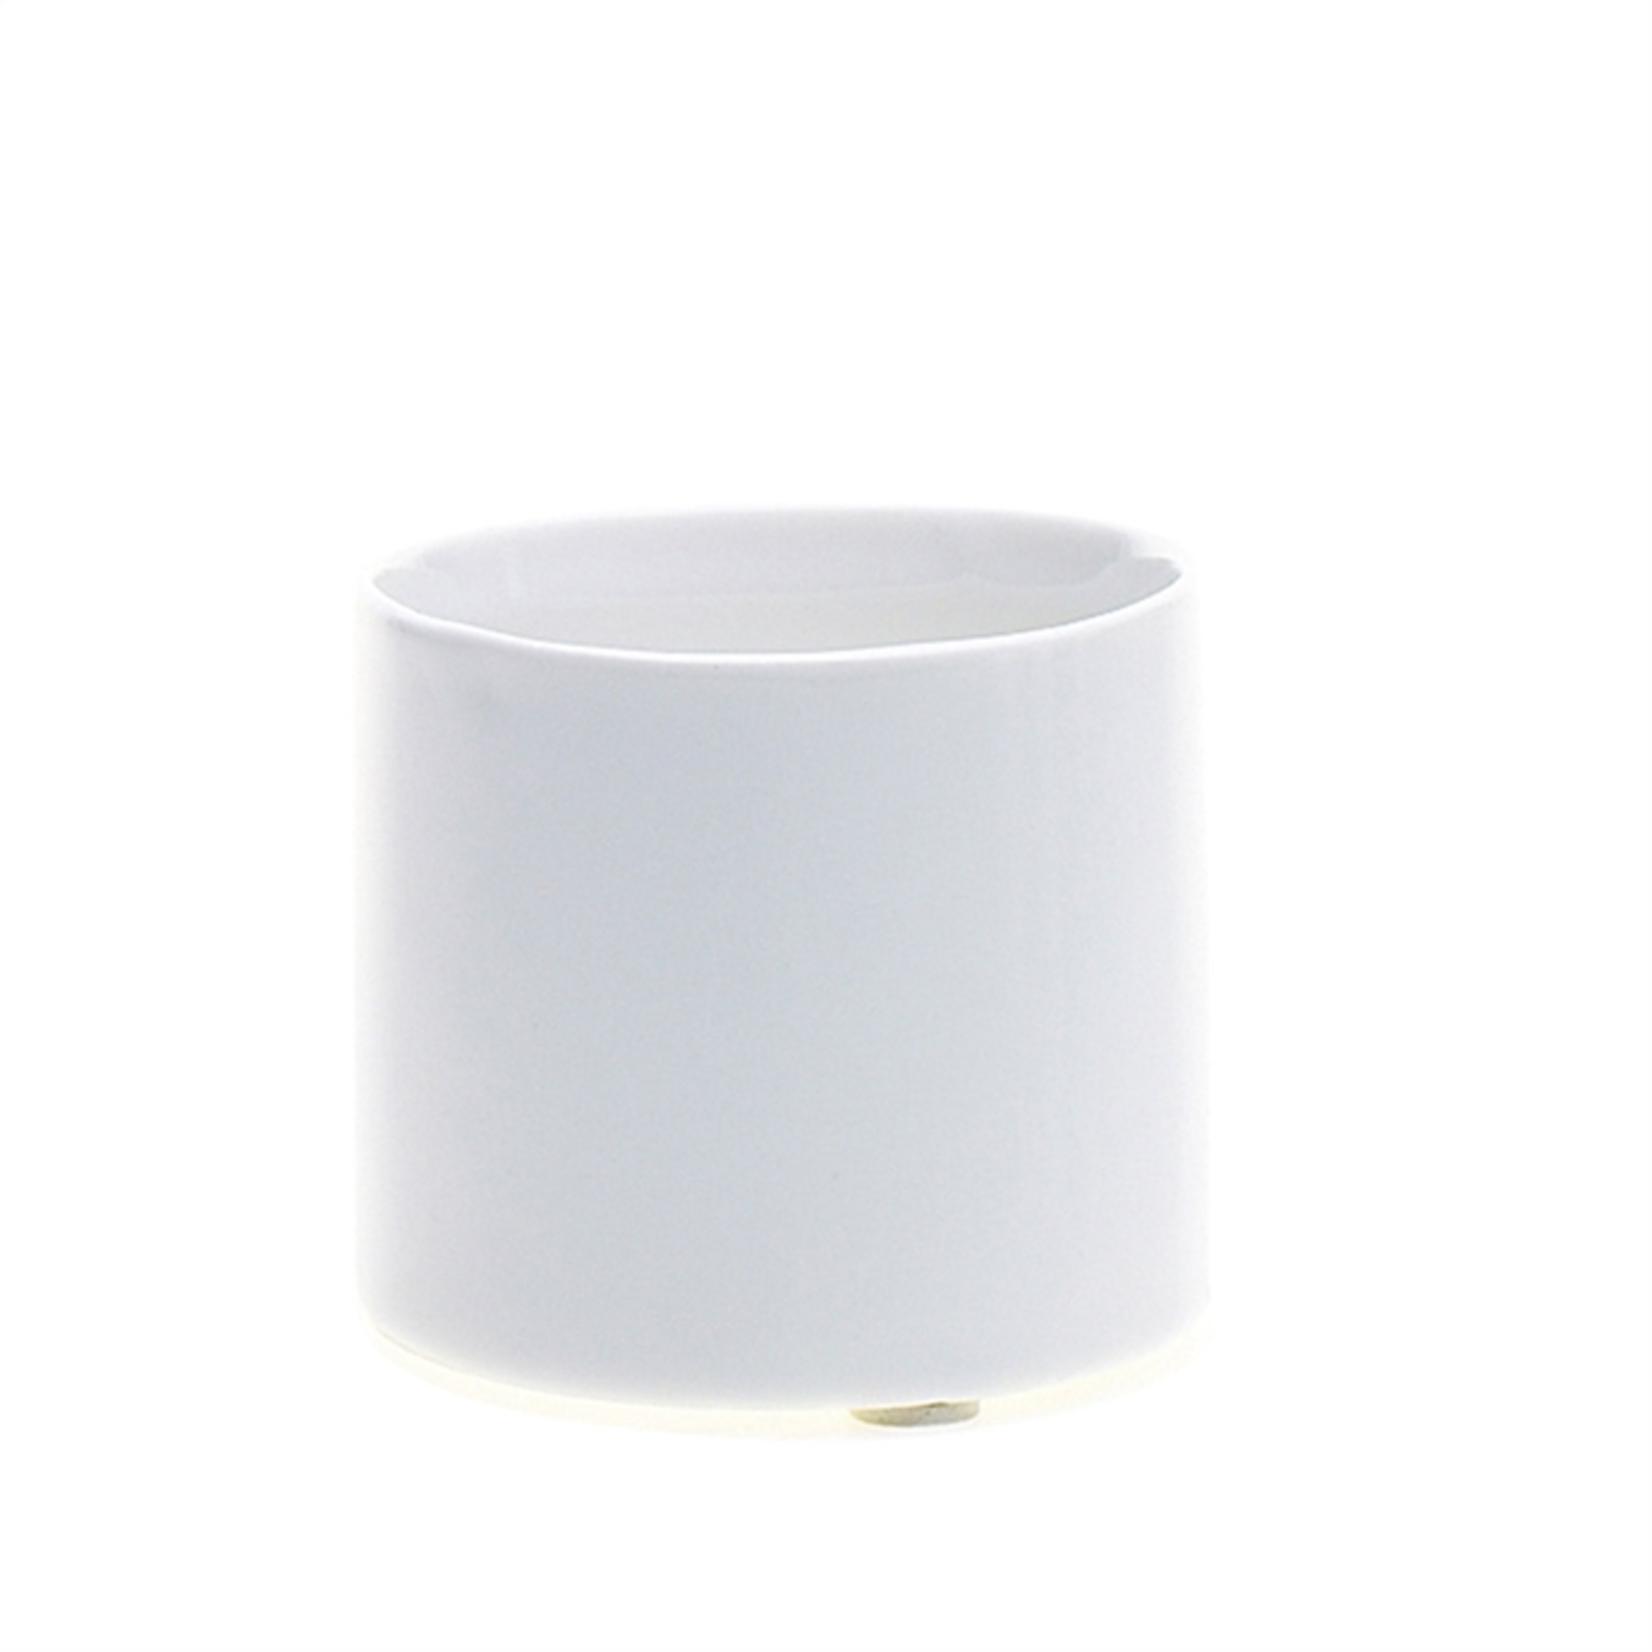 2.5'' X 2.5'' WHITE Brooklyn Vase (AD)